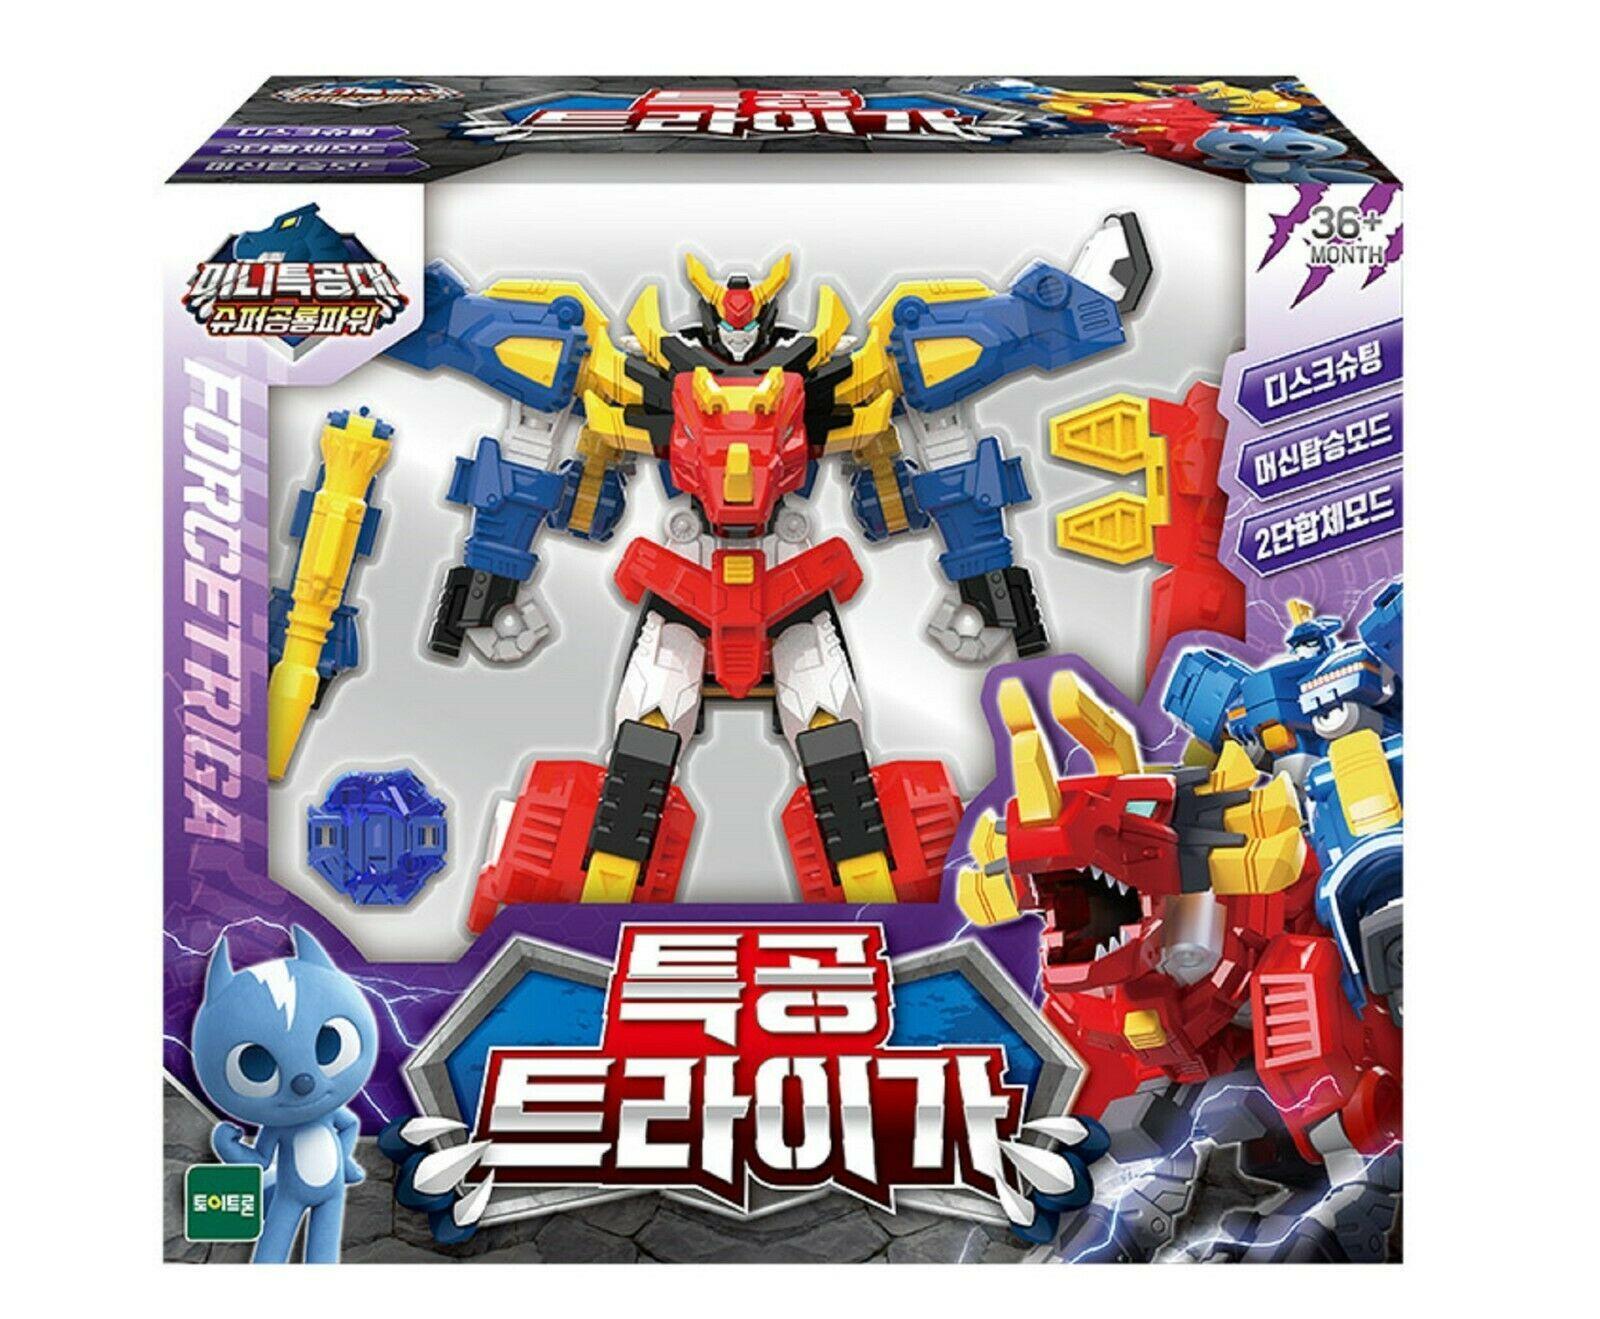 Miniforce Force Triga Super Dinosaur Power Action Figure Transforming Toy Robot